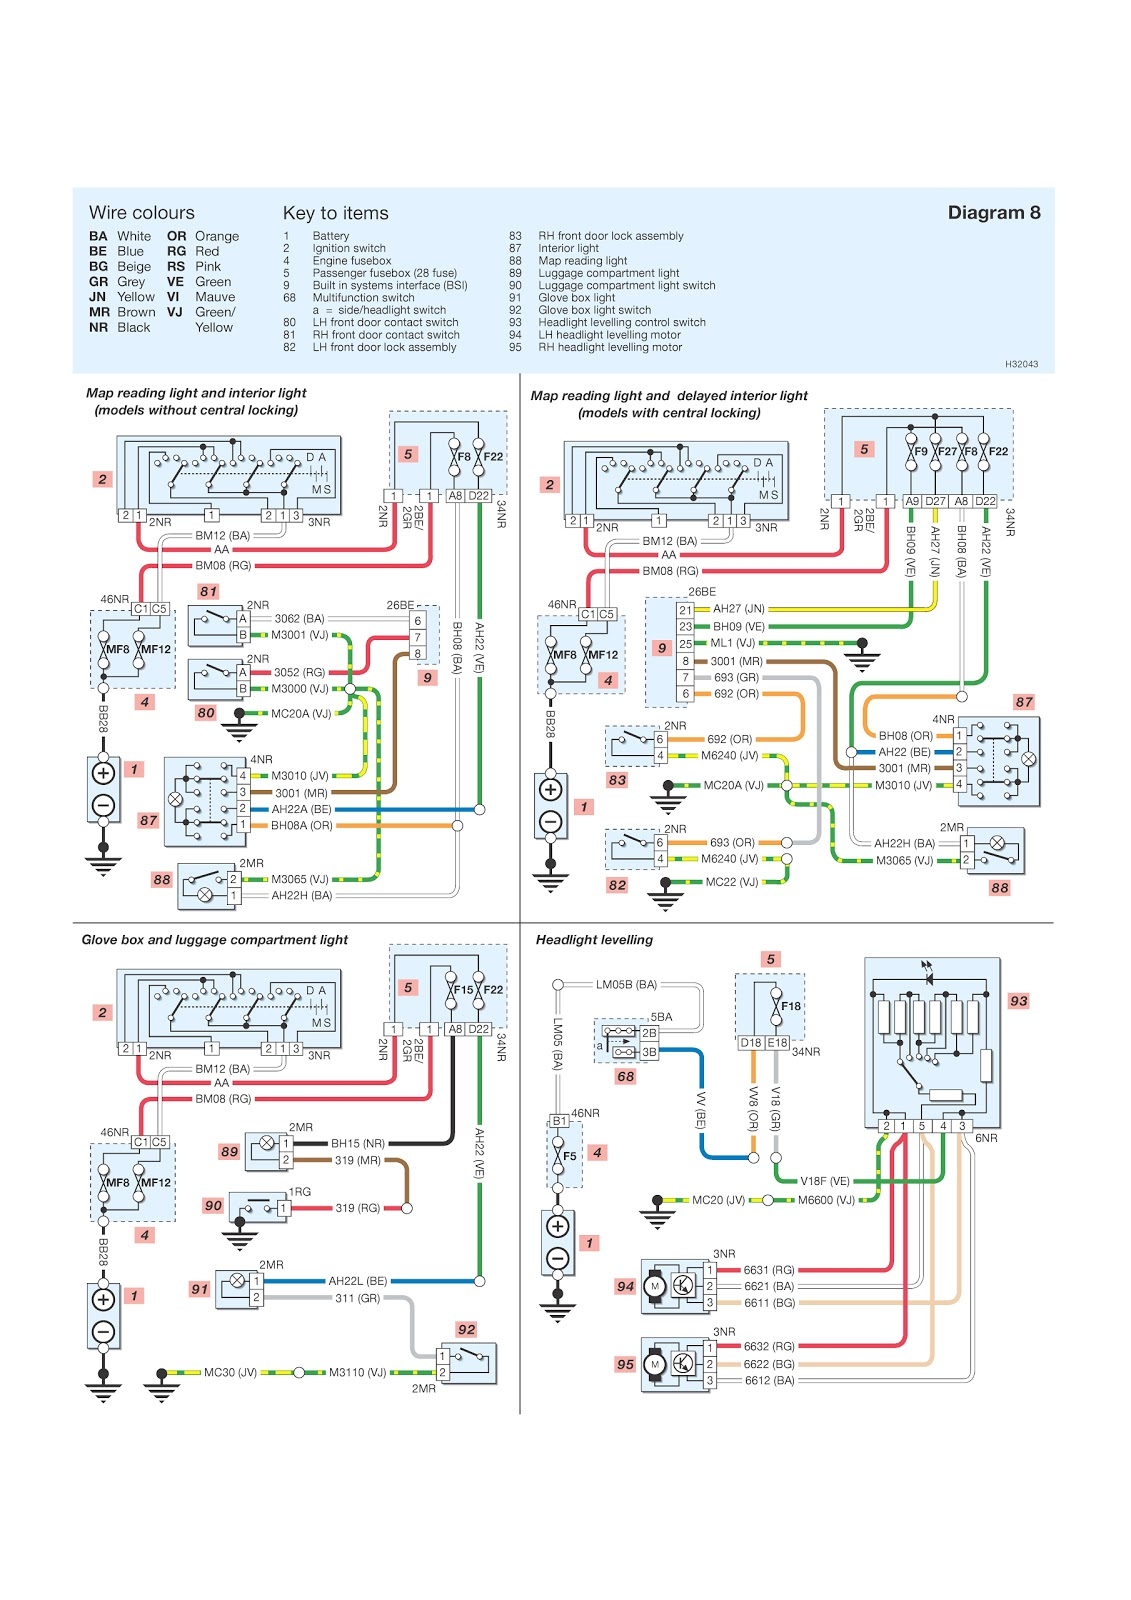 peugeot 206 head unit wiring diagram | wiring diagram peugeot elyseo wiring diagram